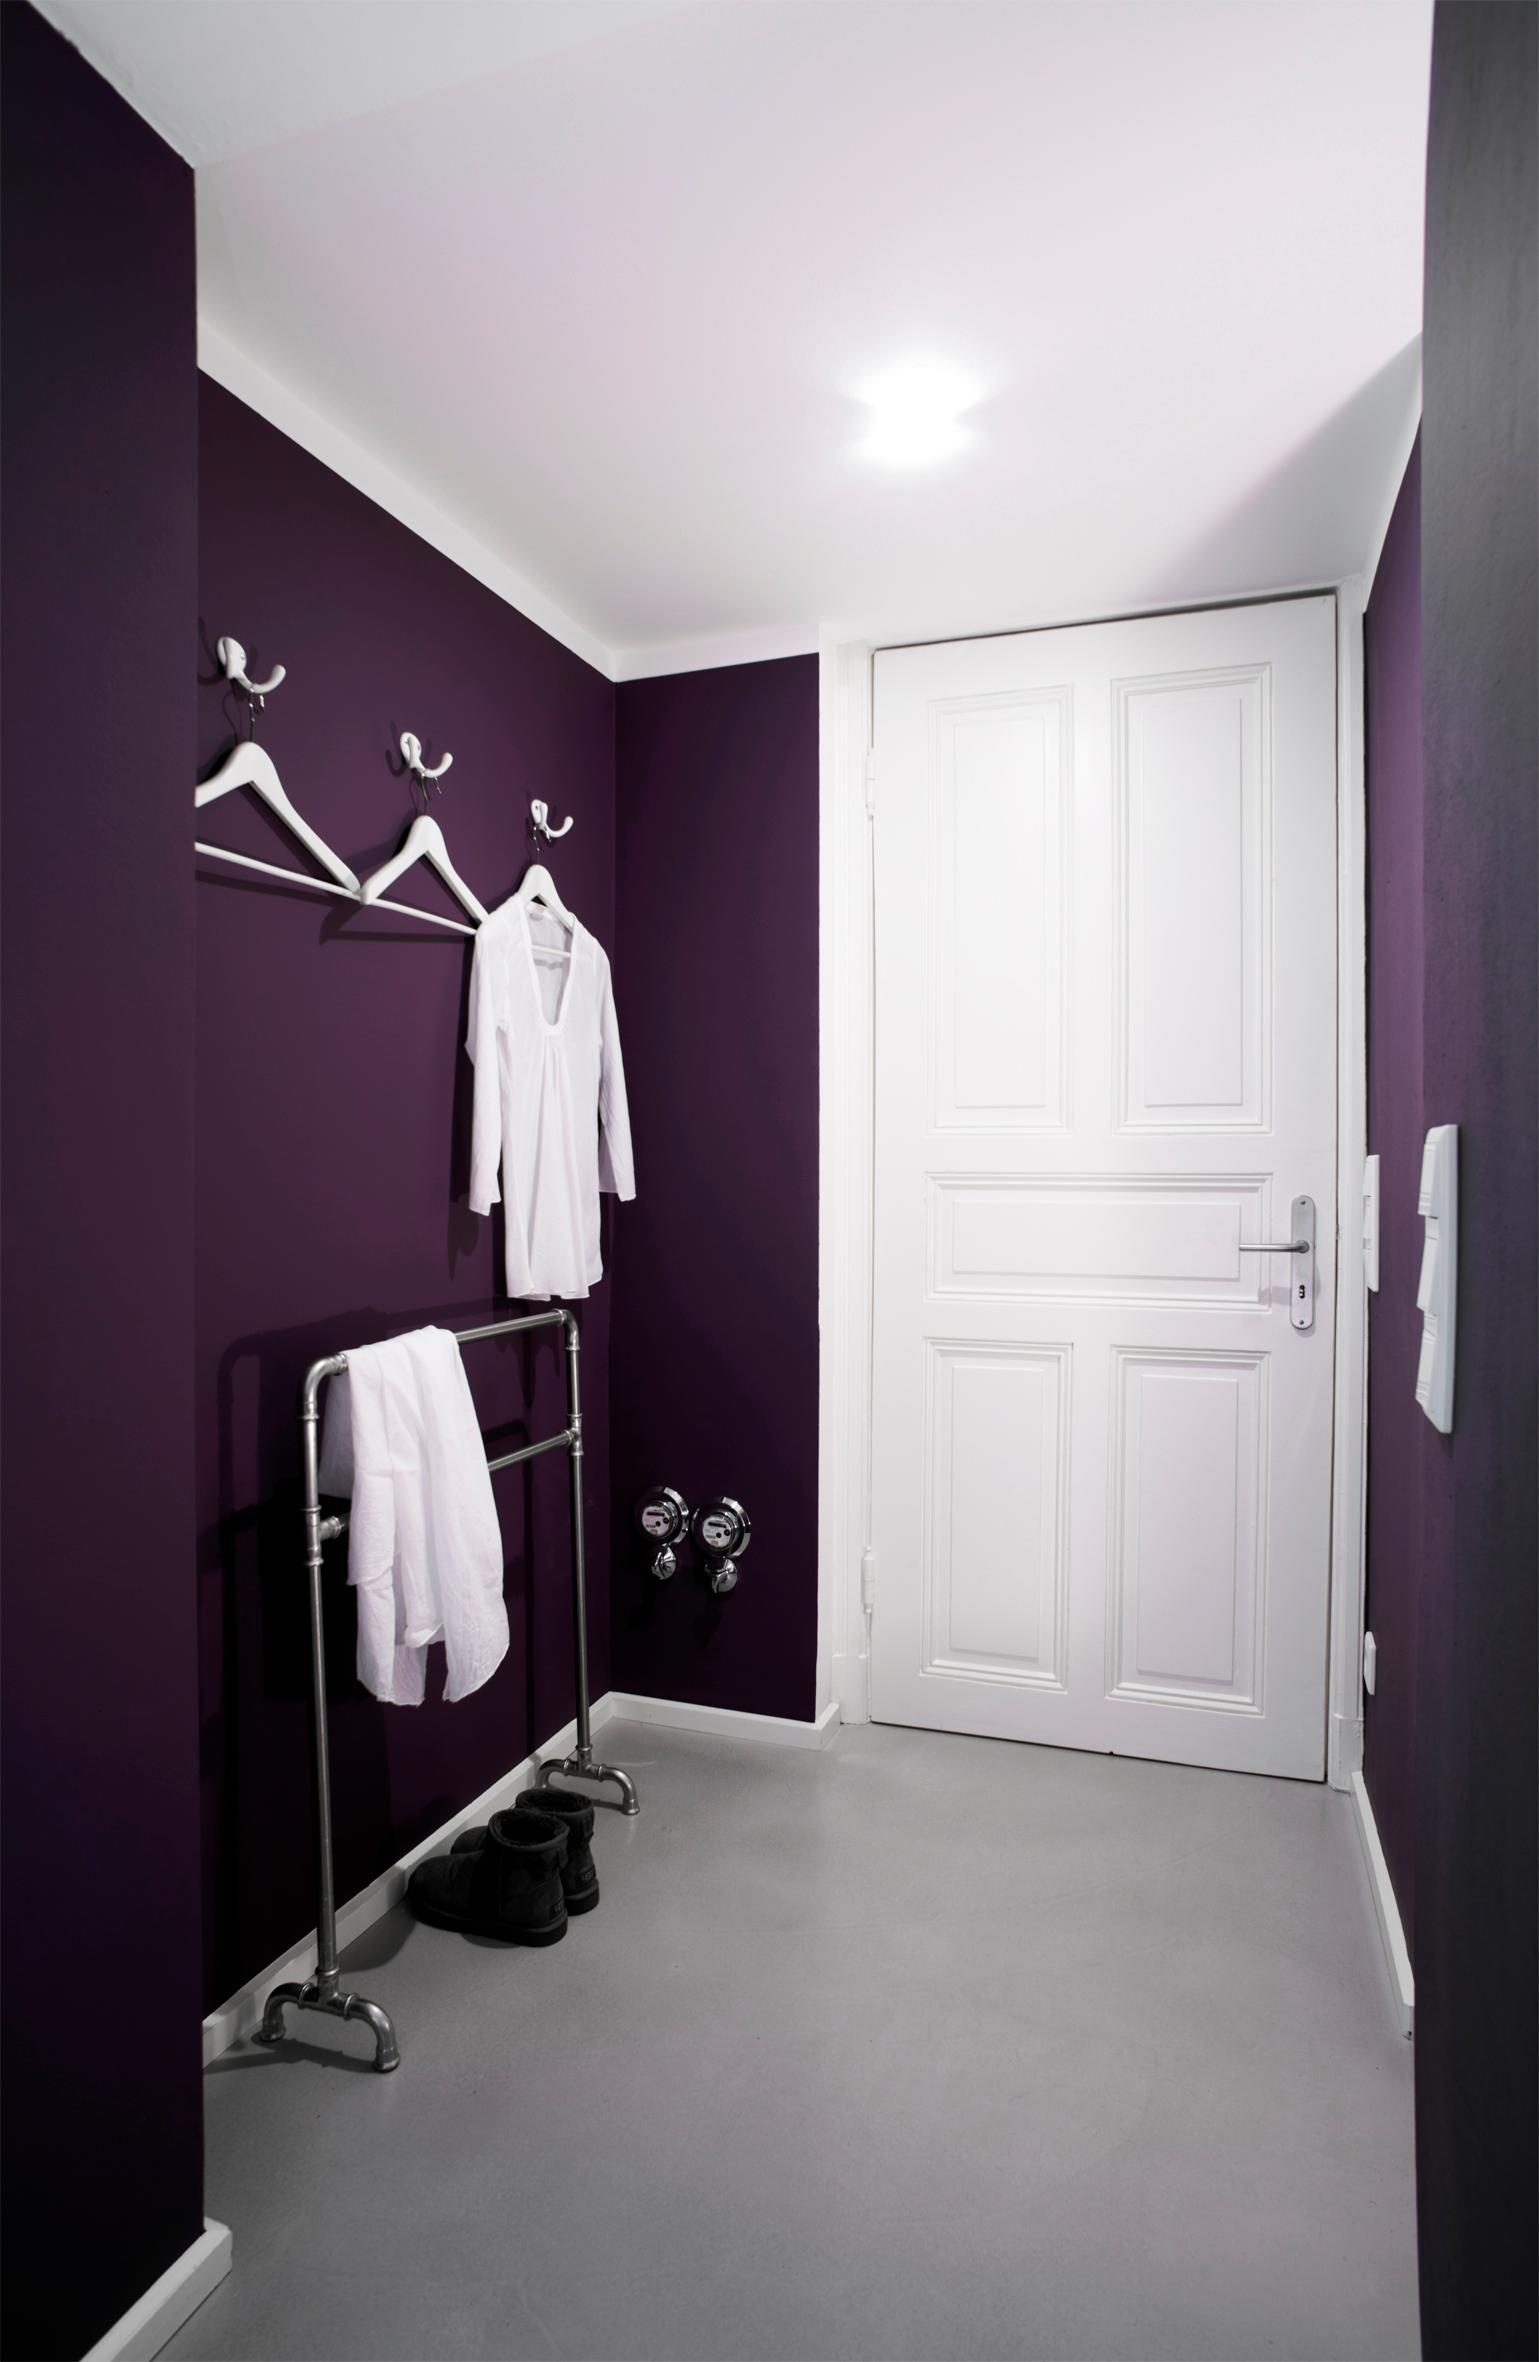 Schlafzimmer ideen wandgestaltung lila  Lila Wandgestaltung • Bilder & Ideen • COUCHstyle